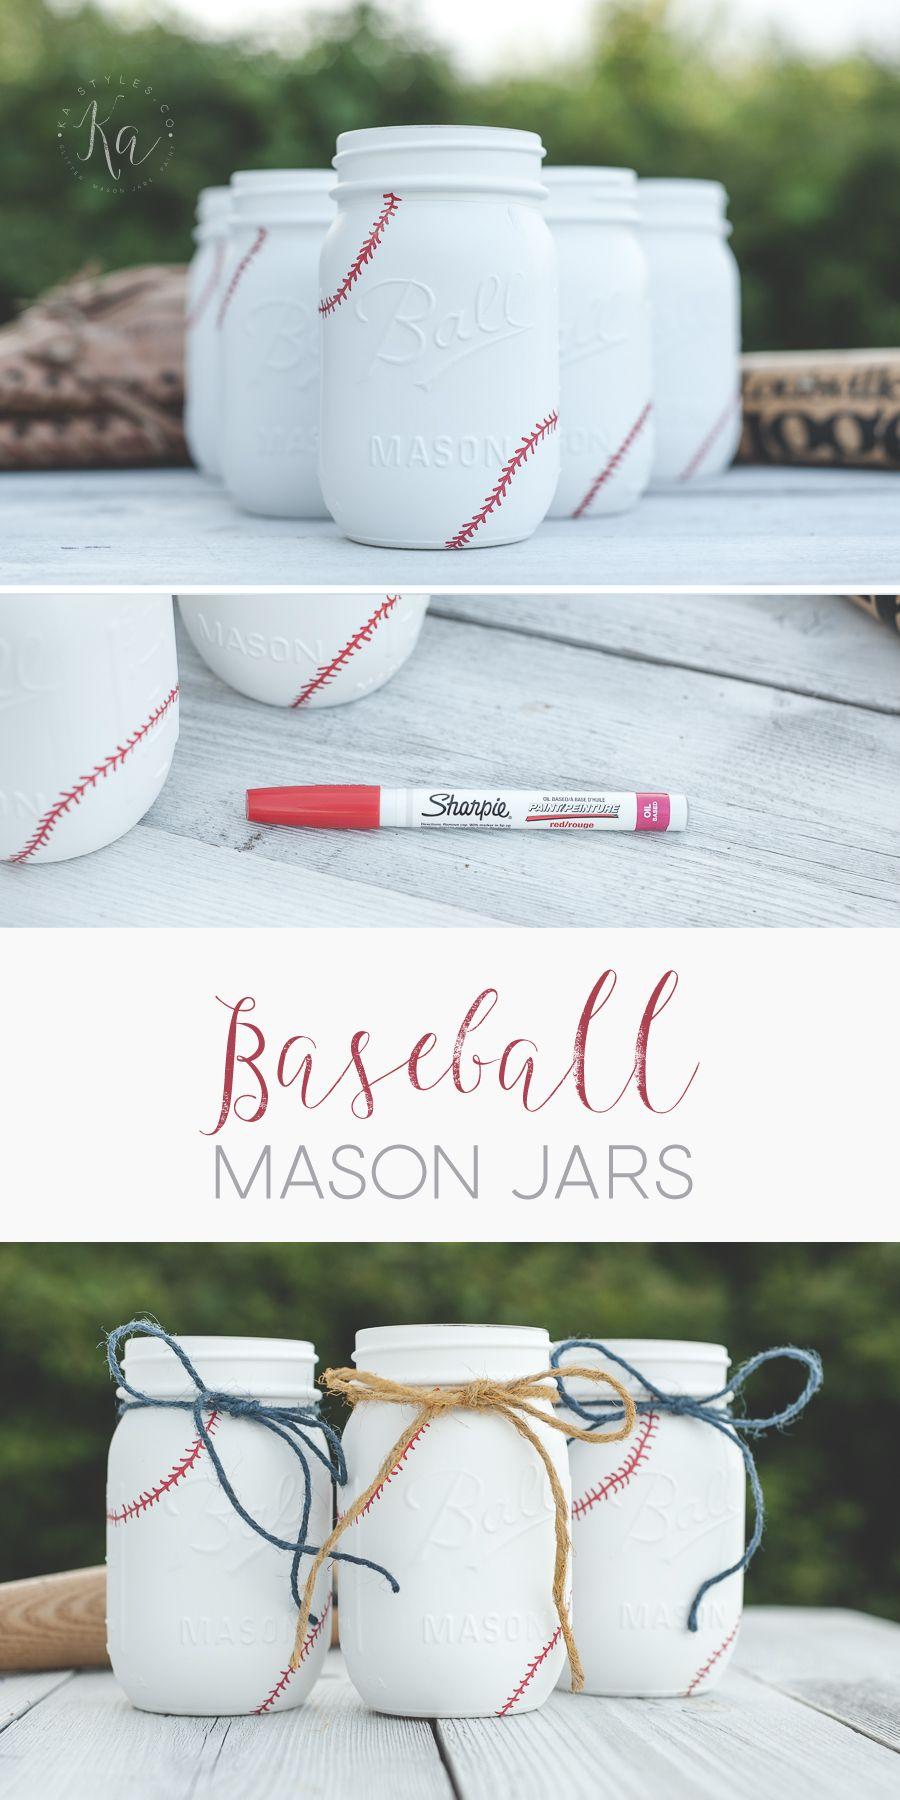 Photo of More Baseball Mason Jars – Sprinkled and Painted at KA Styles.co